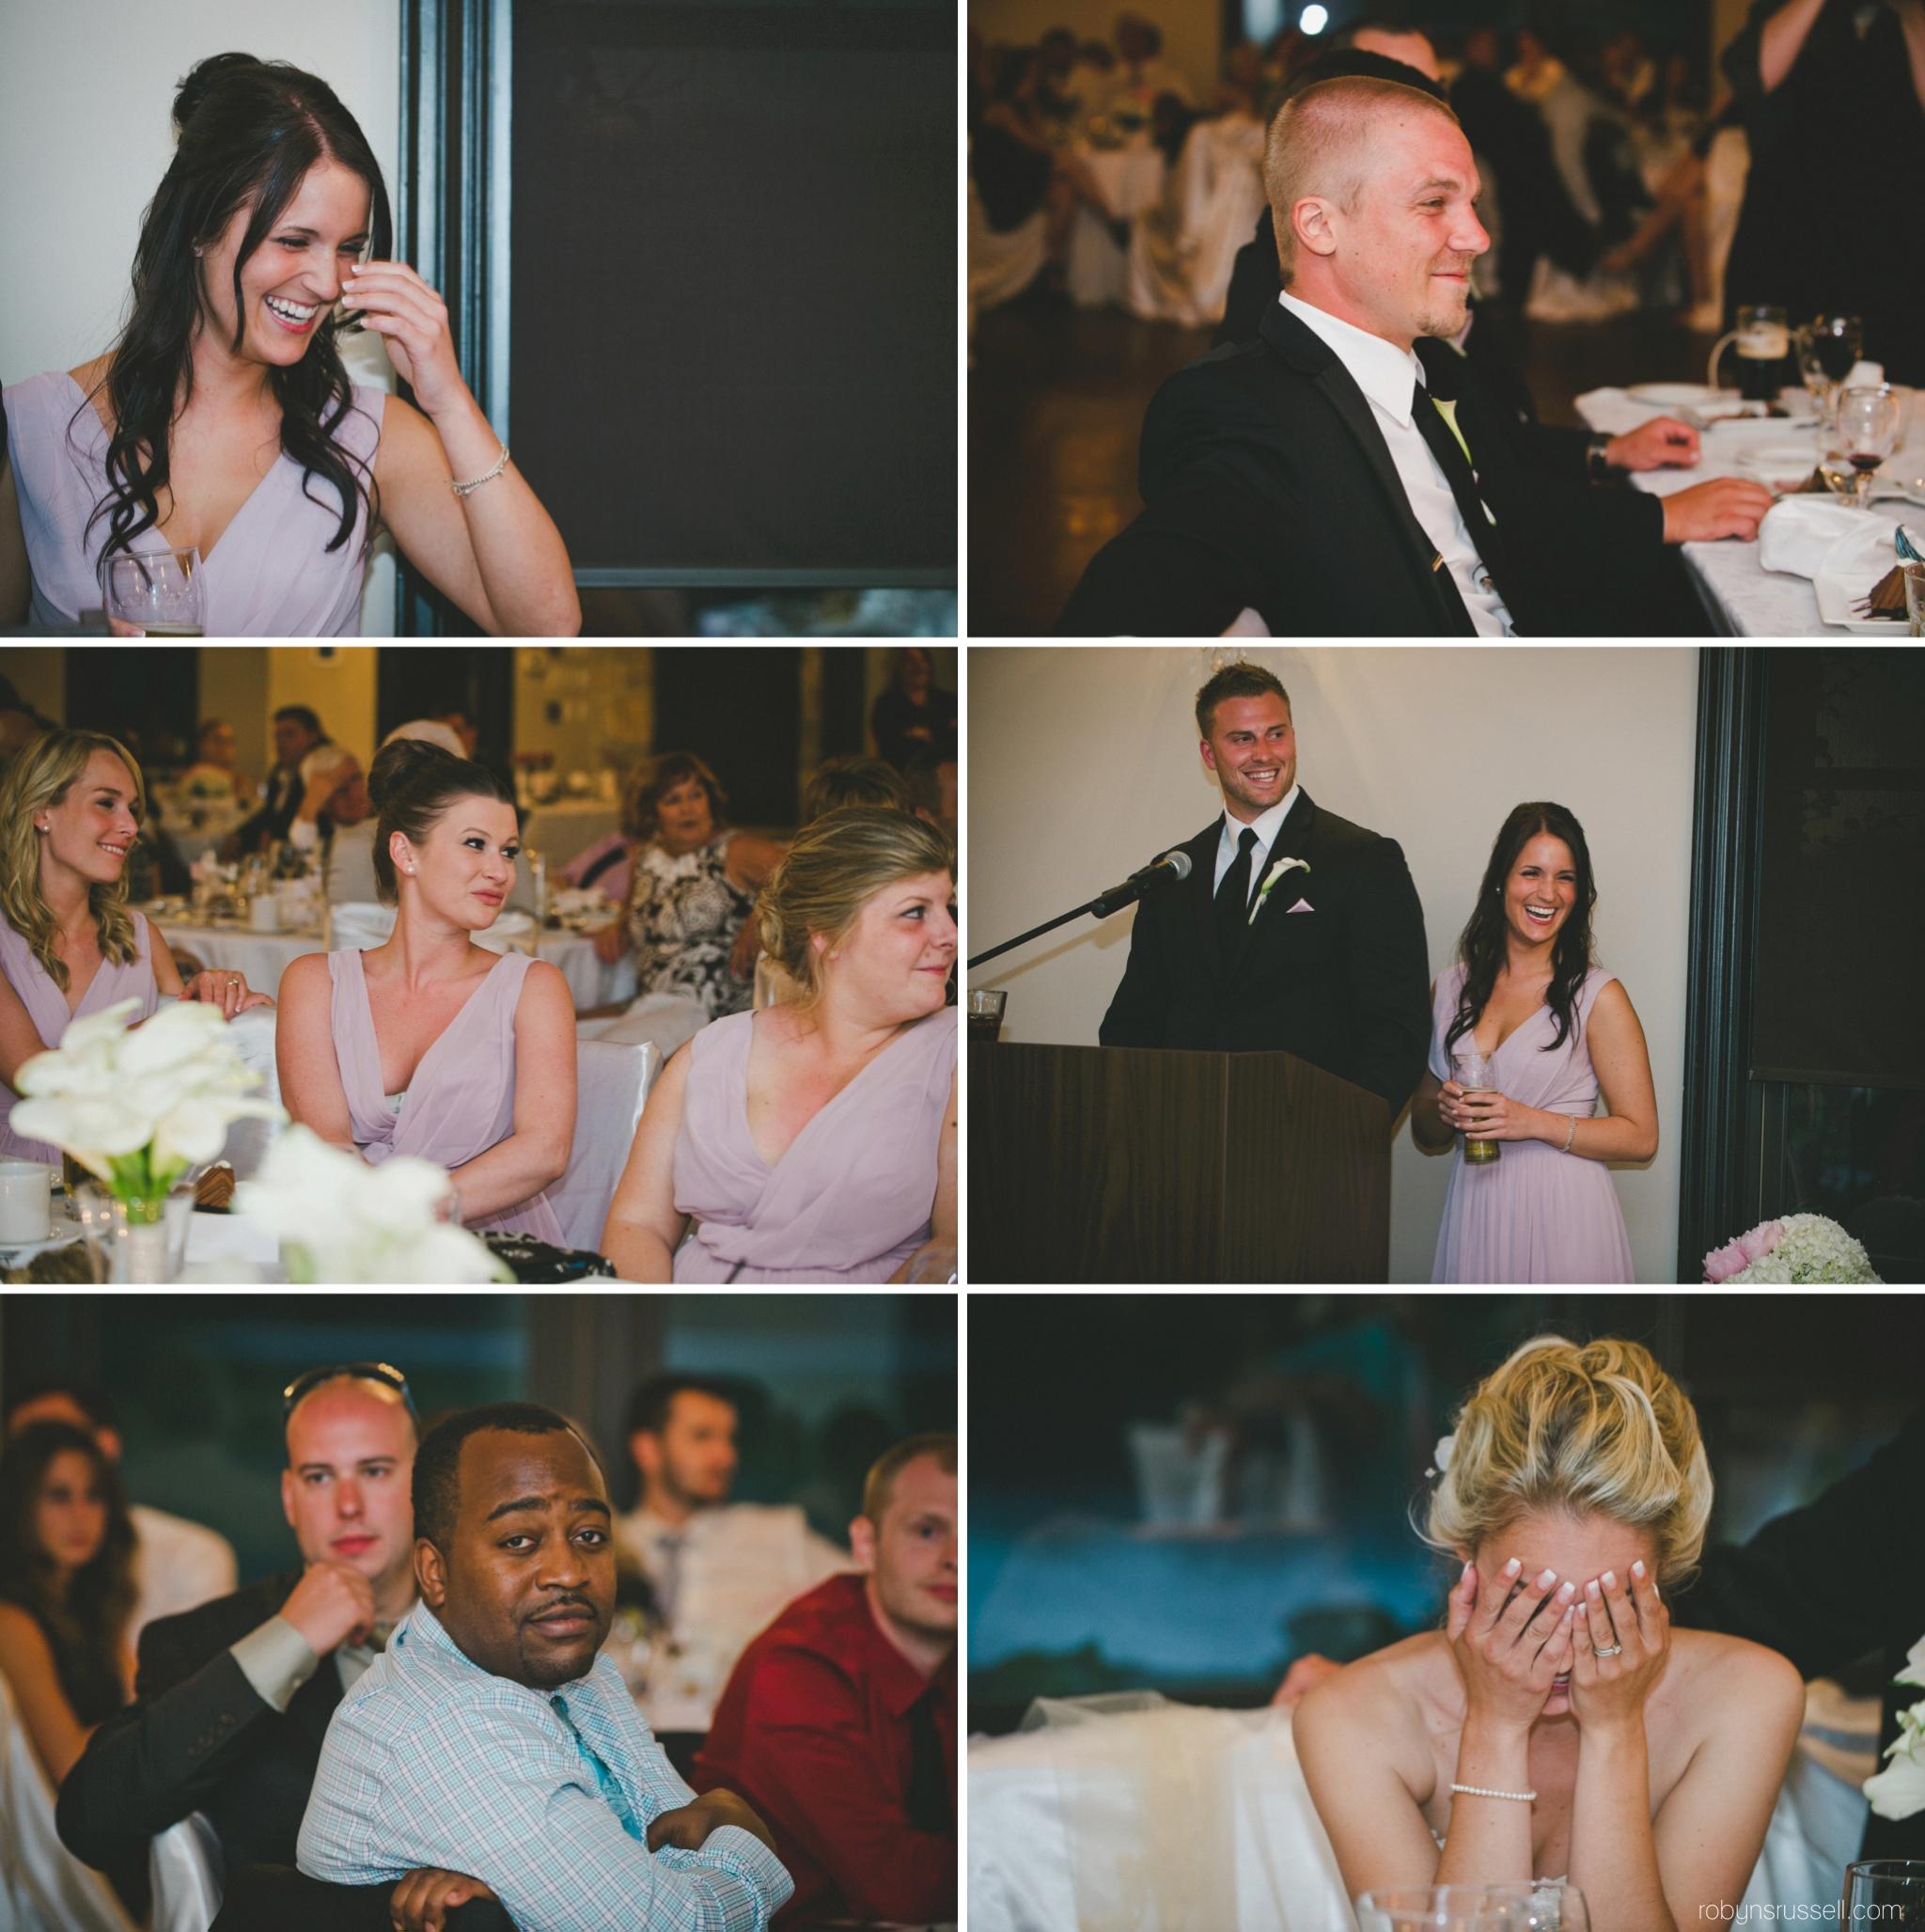 64-wedding-speeches-bride-and-groom.jpg